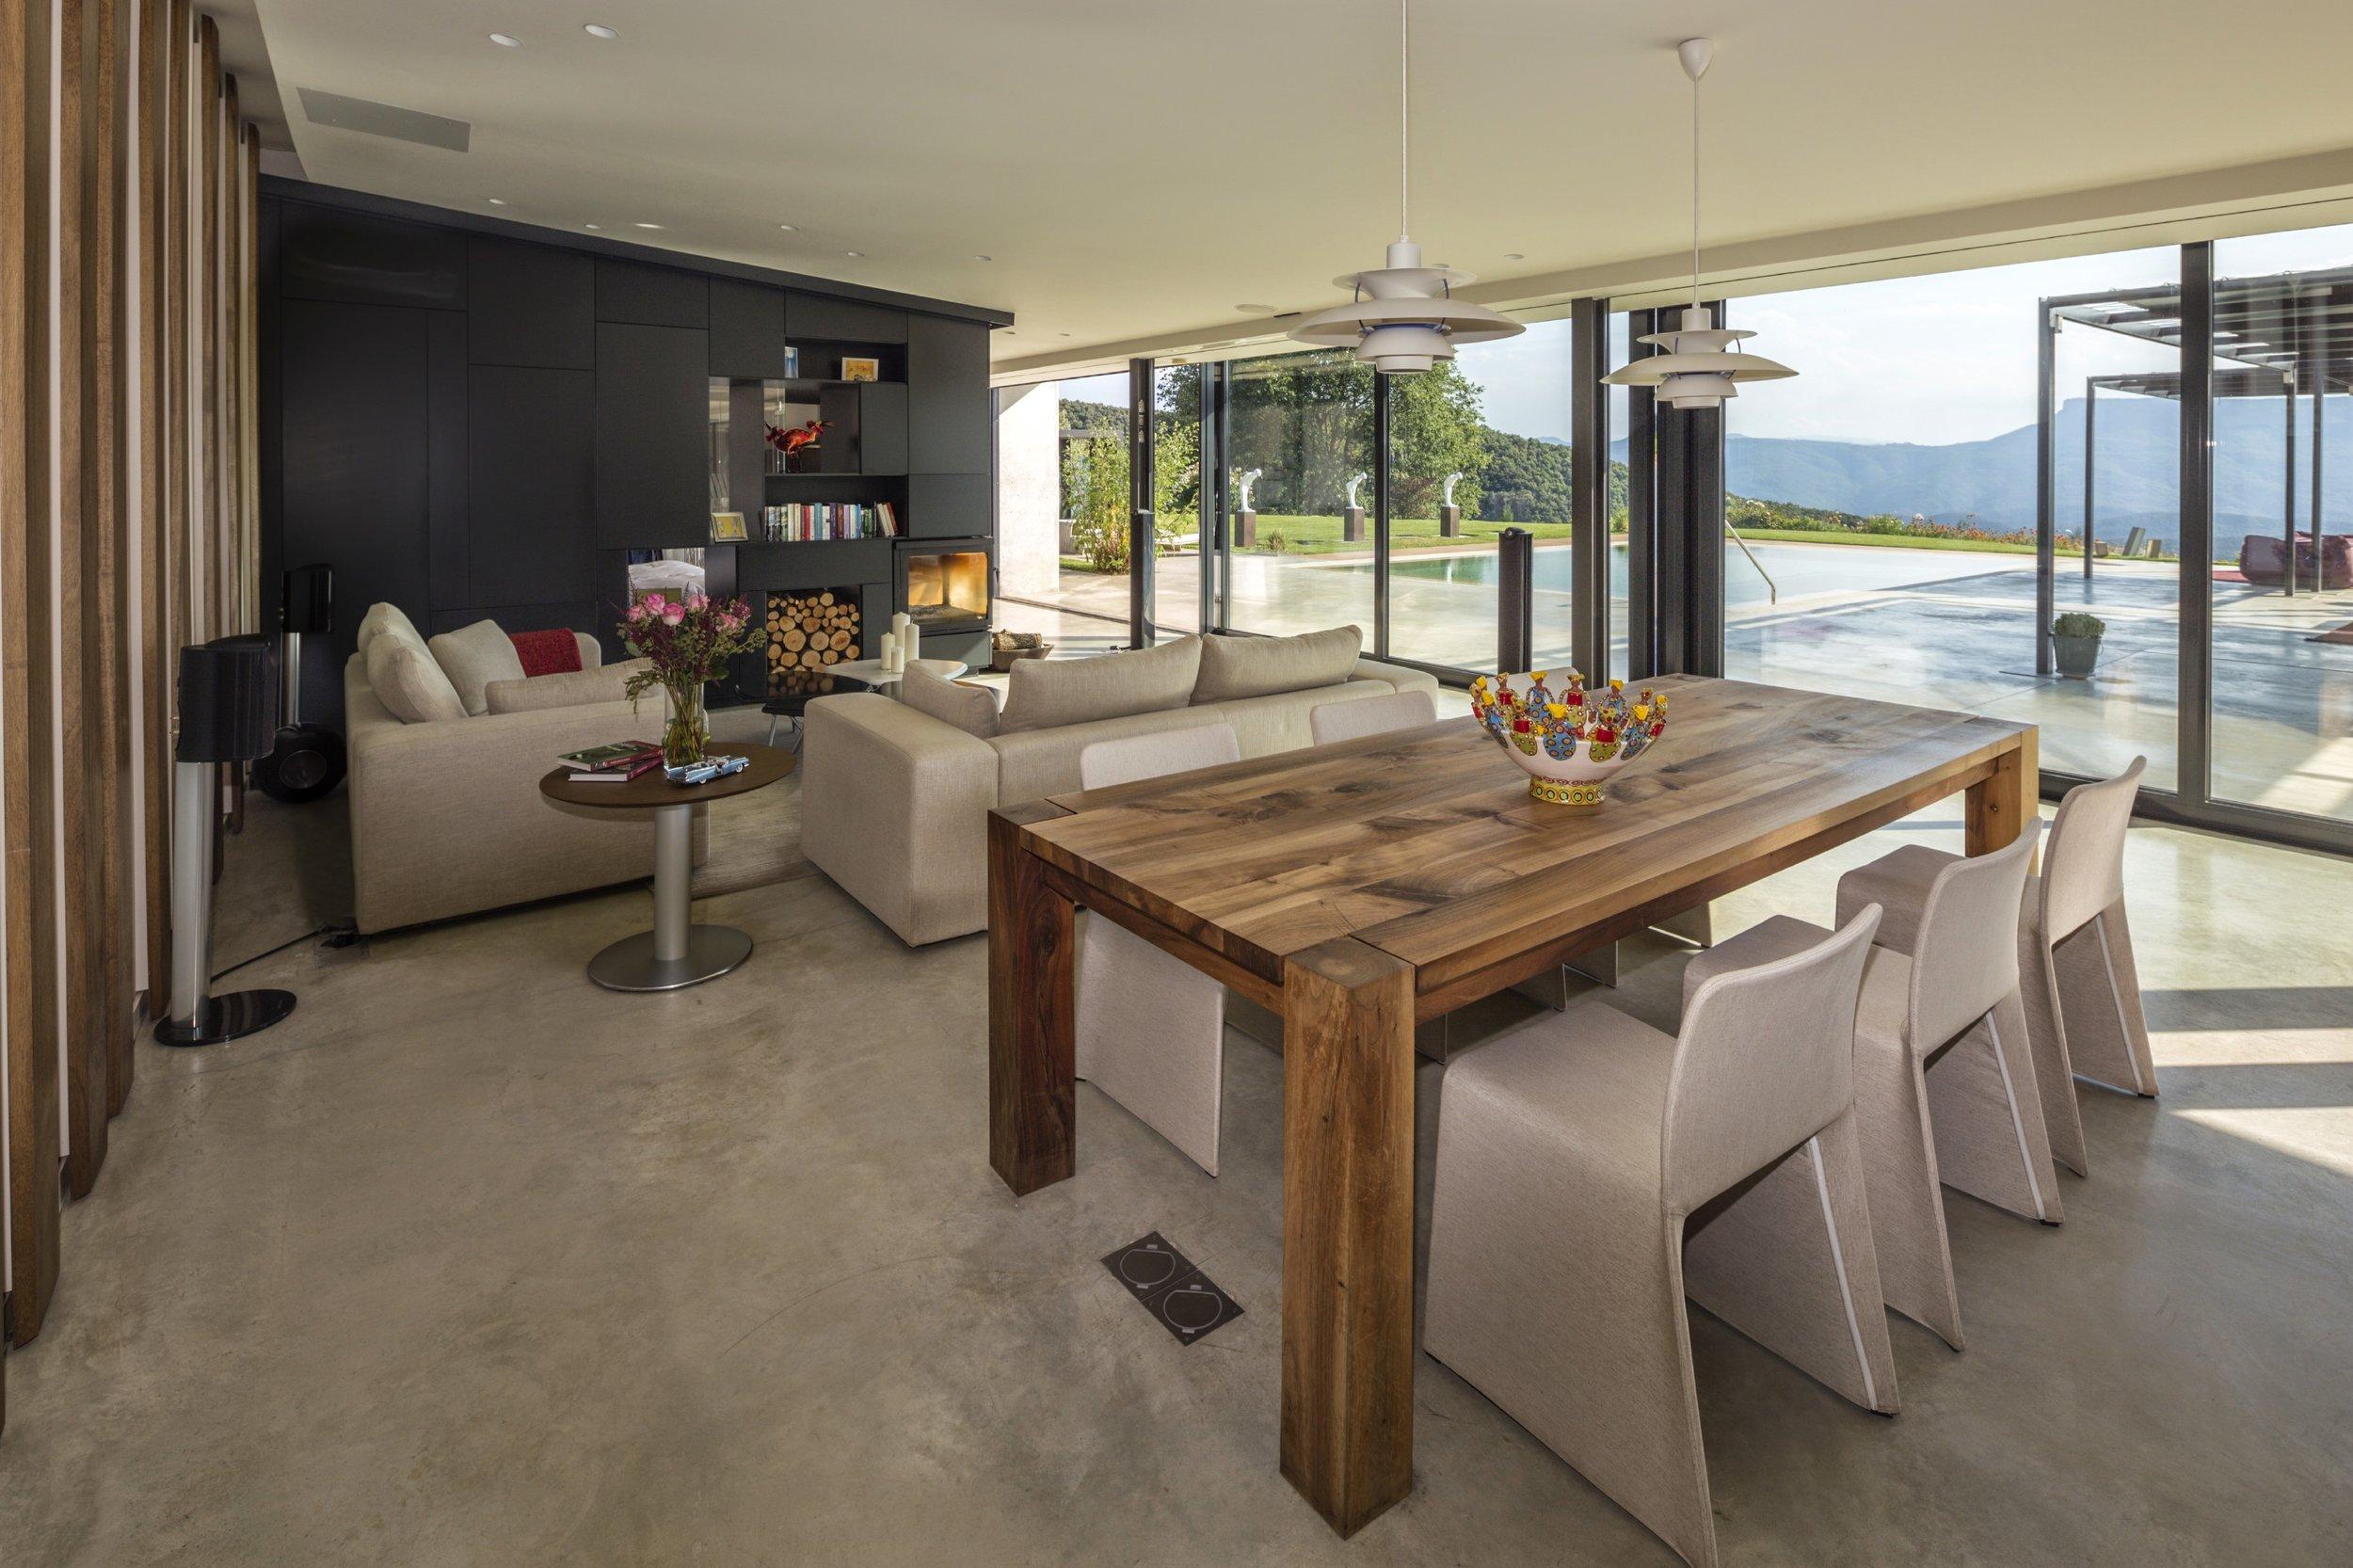 casa jens arquitecto en begur costa brava barcelona foto de rafael vargas (3) interiorismo 555project